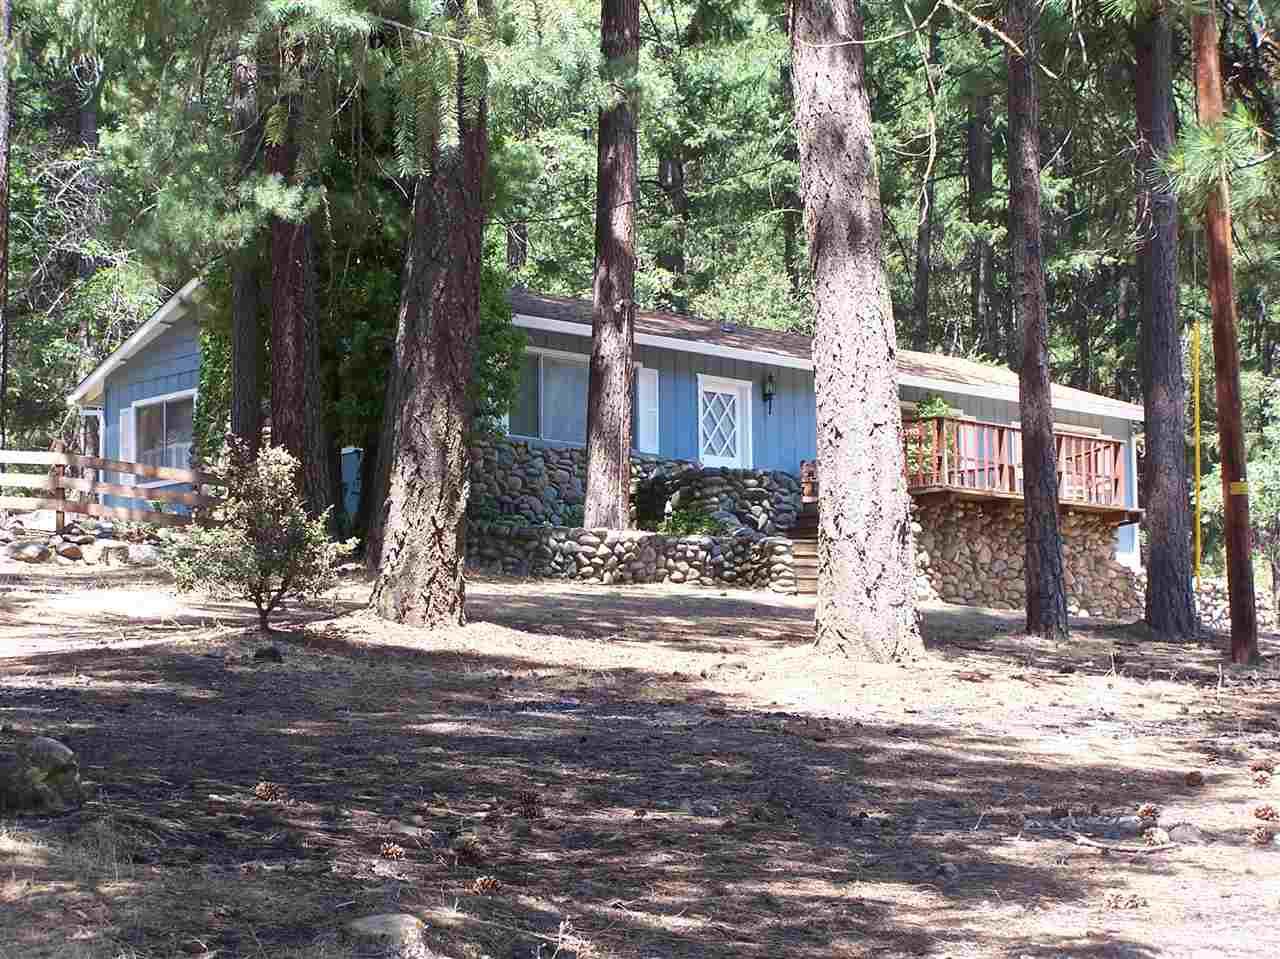 13915 Patterson Creek Rd., Fort Jones, CA 96032